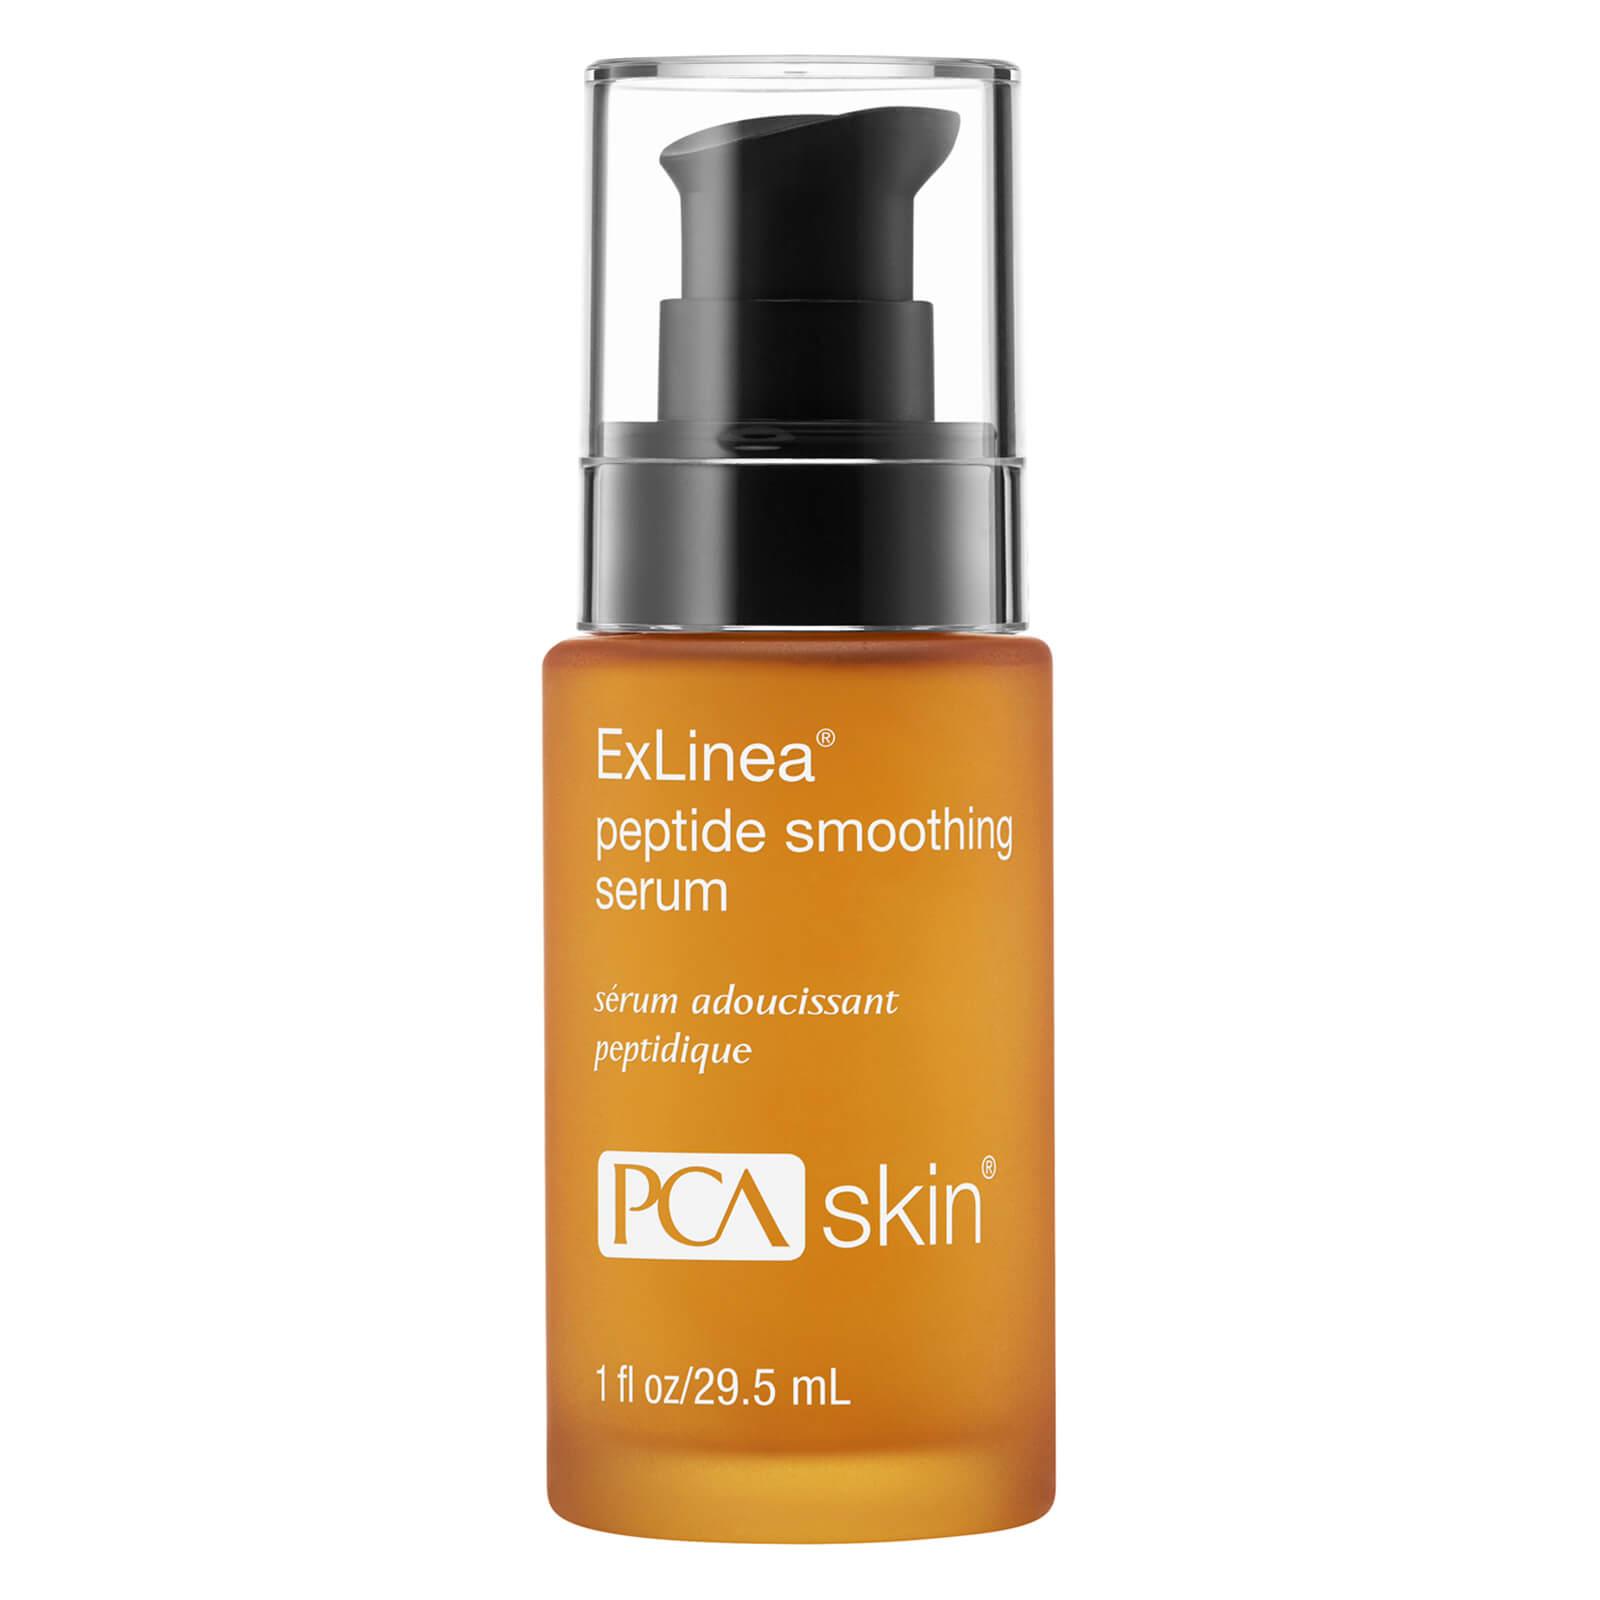 SkinCareRx:精选理肤泉、斯佳唯婷等紧致抗老护肤